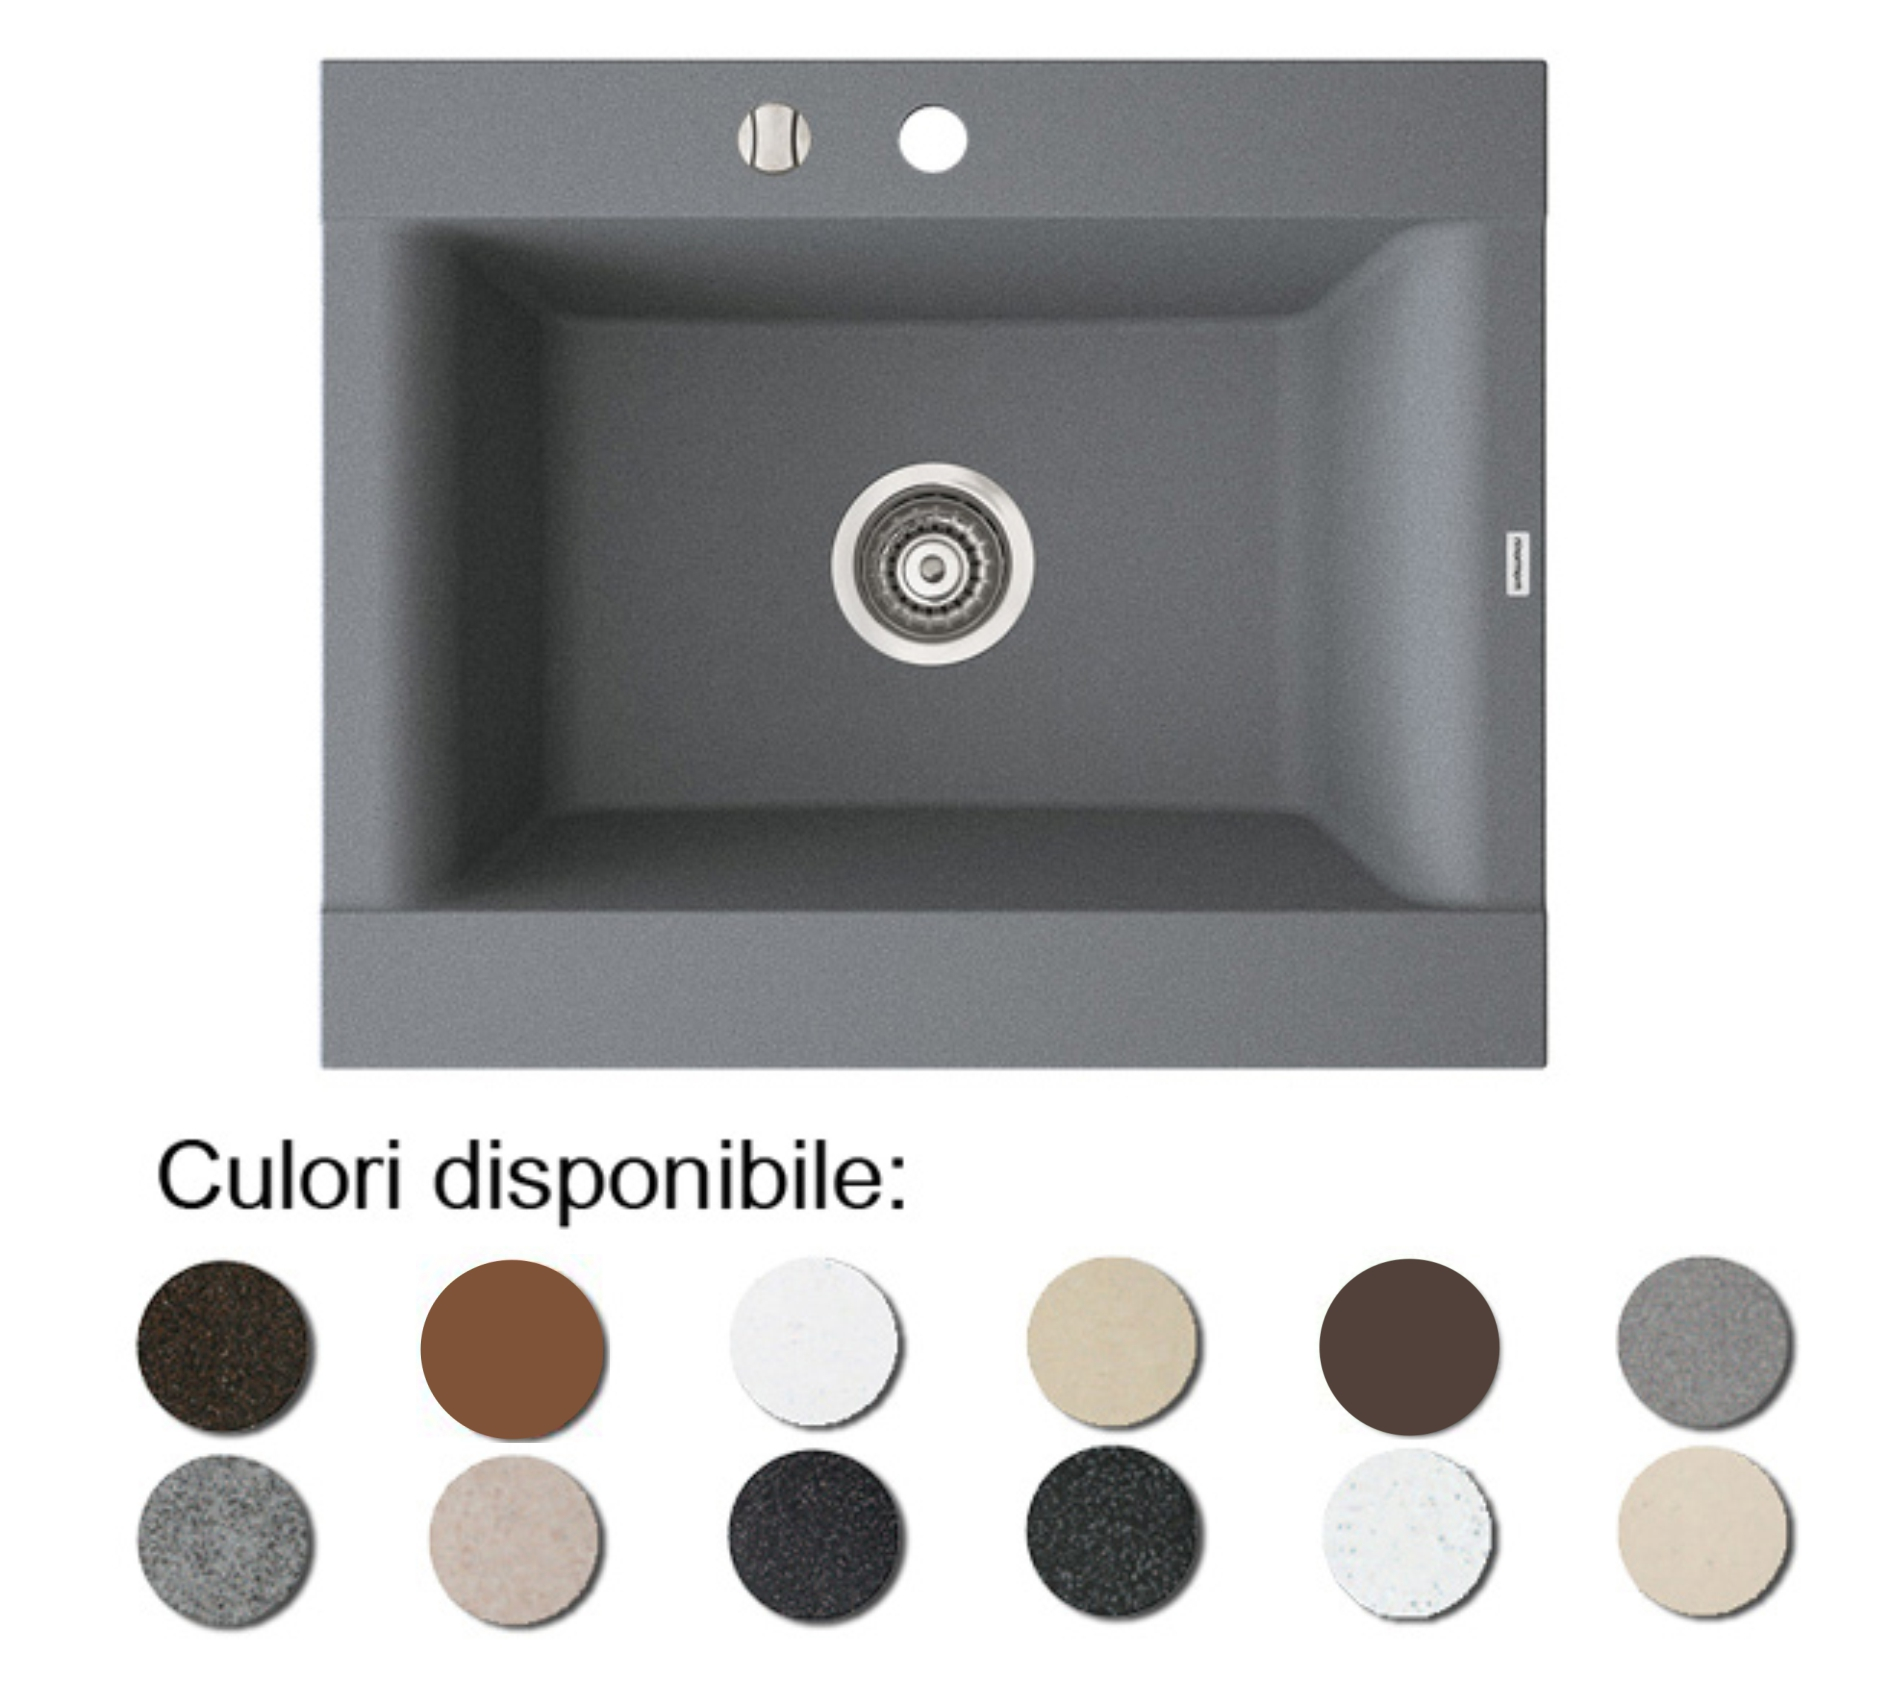 Foto Chiuveta Bucatarie Granit Compozit Anticalcar Cuva Dreptunghiulara Ingusta Spatio